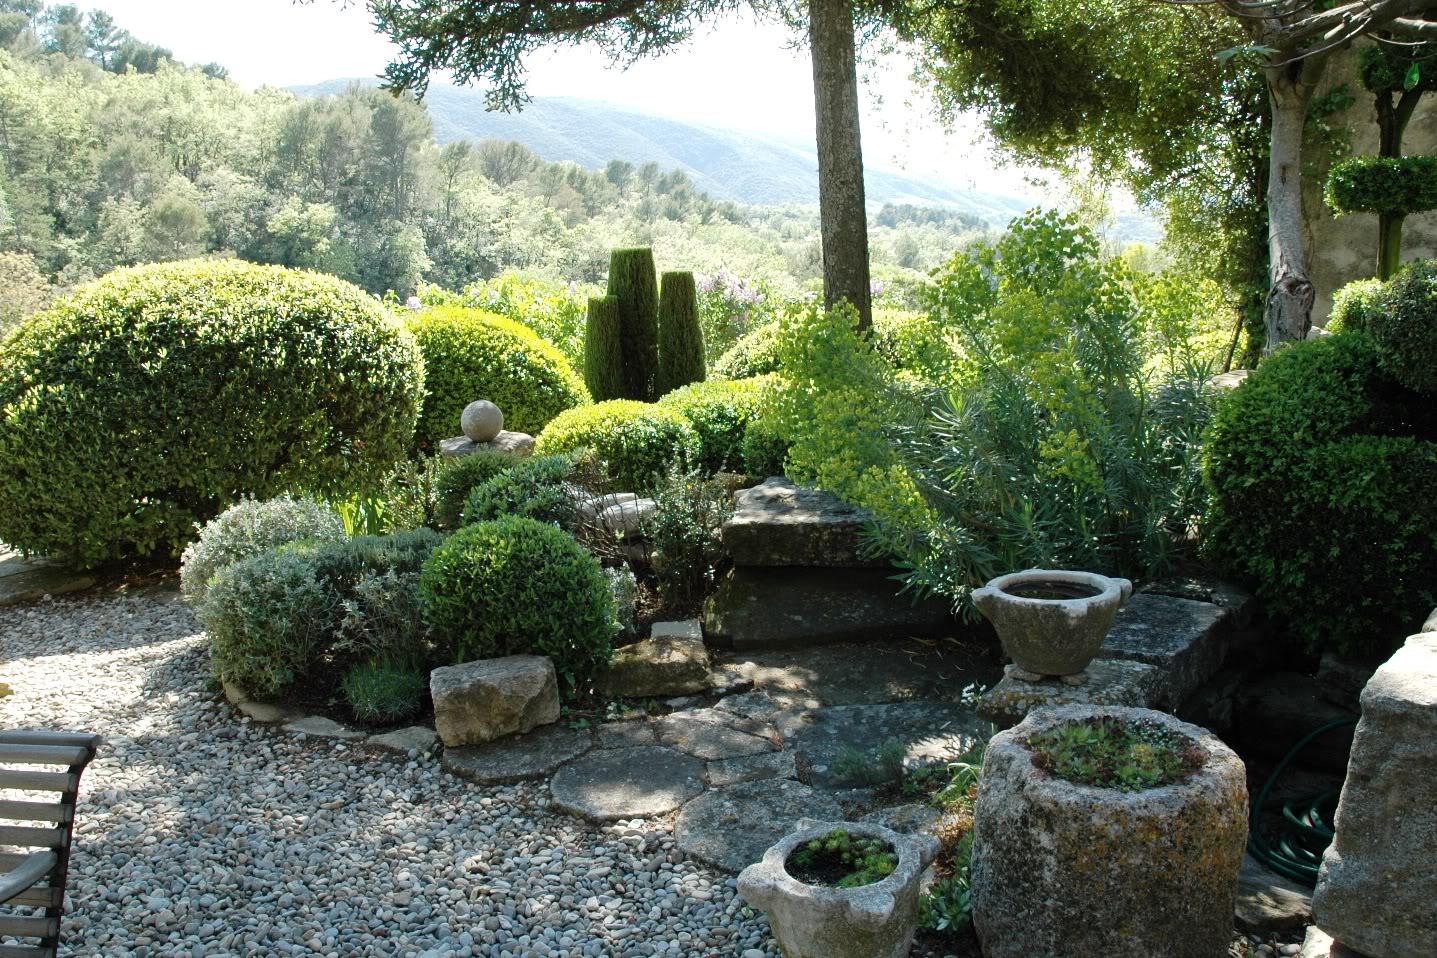 paradis express le jardin de la louve. Black Bedroom Furniture Sets. Home Design Ideas